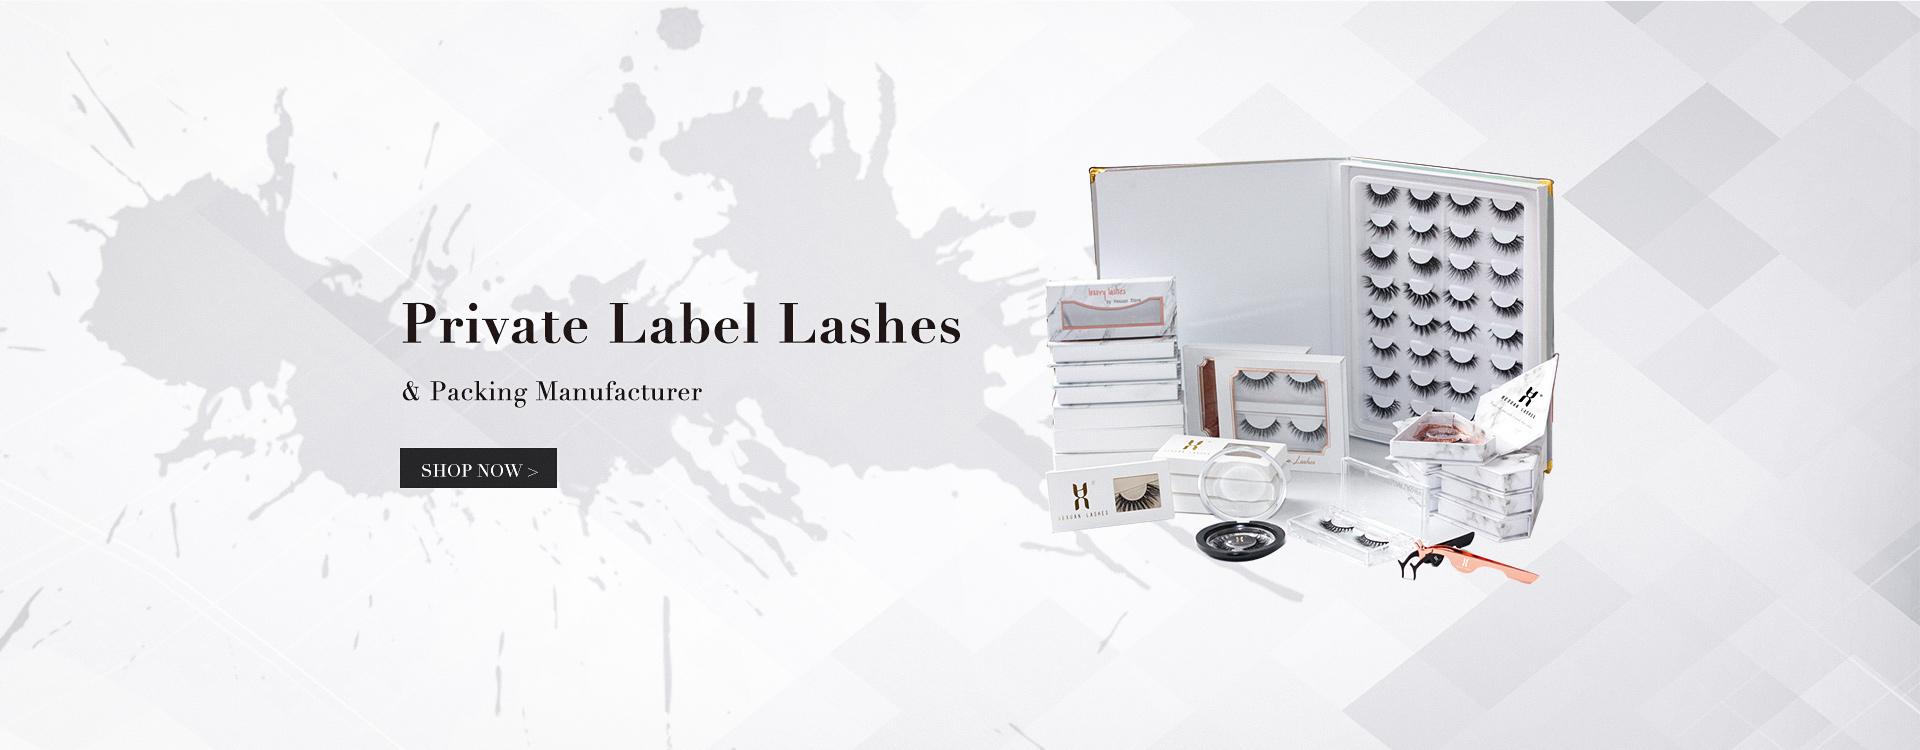 3d mink lashes, lashes factory, lashes wholesale, lashes